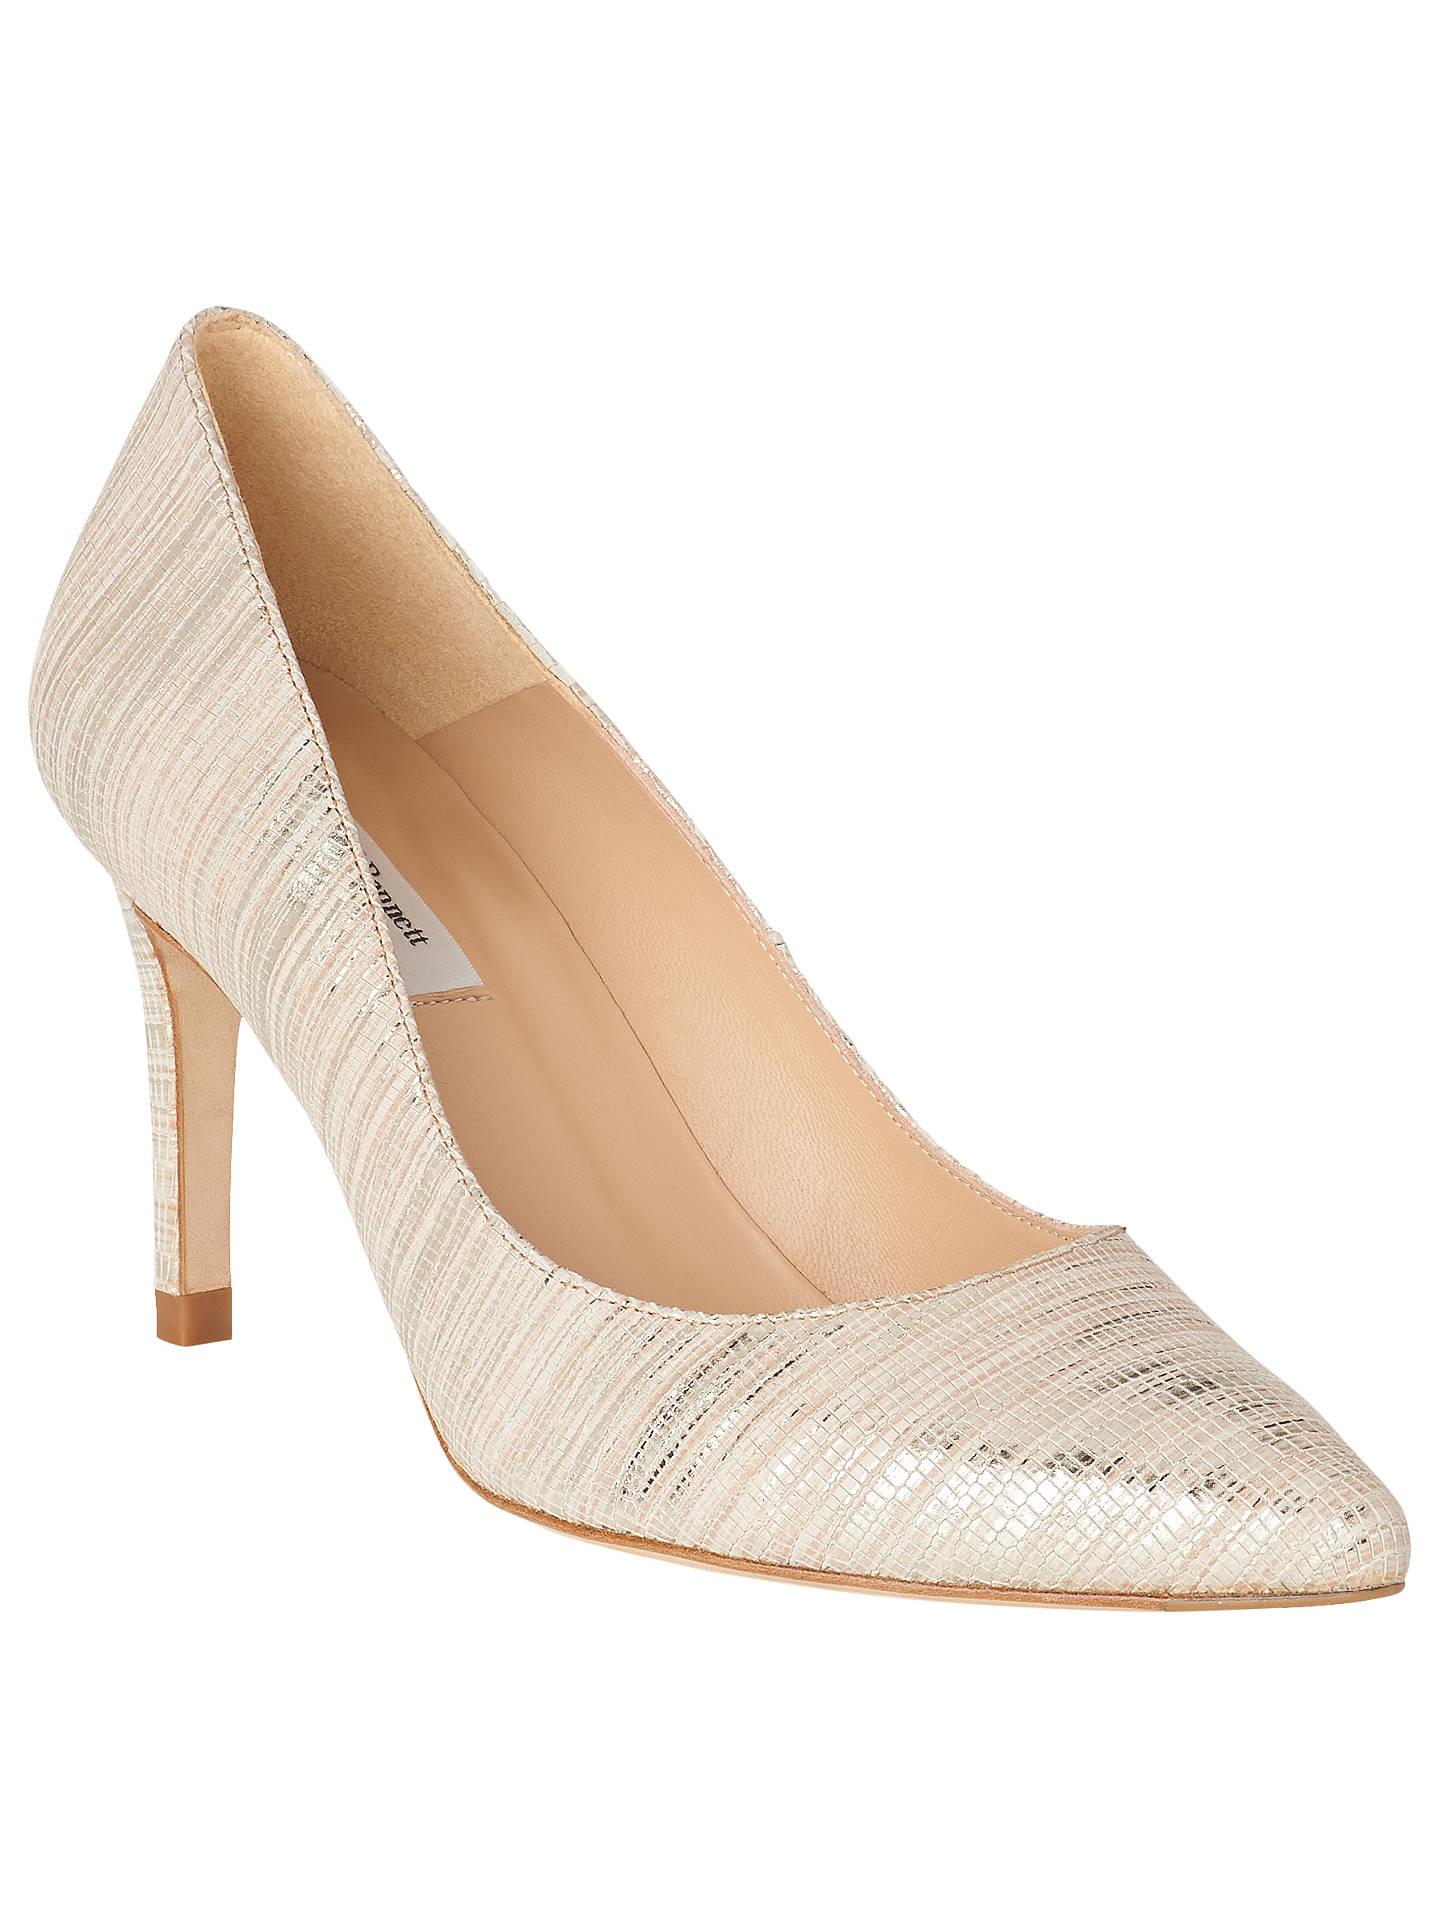 Soft Bennett Shoes Gold Court Leather Floret K 2 Stiletto Heeled 4X1dFn